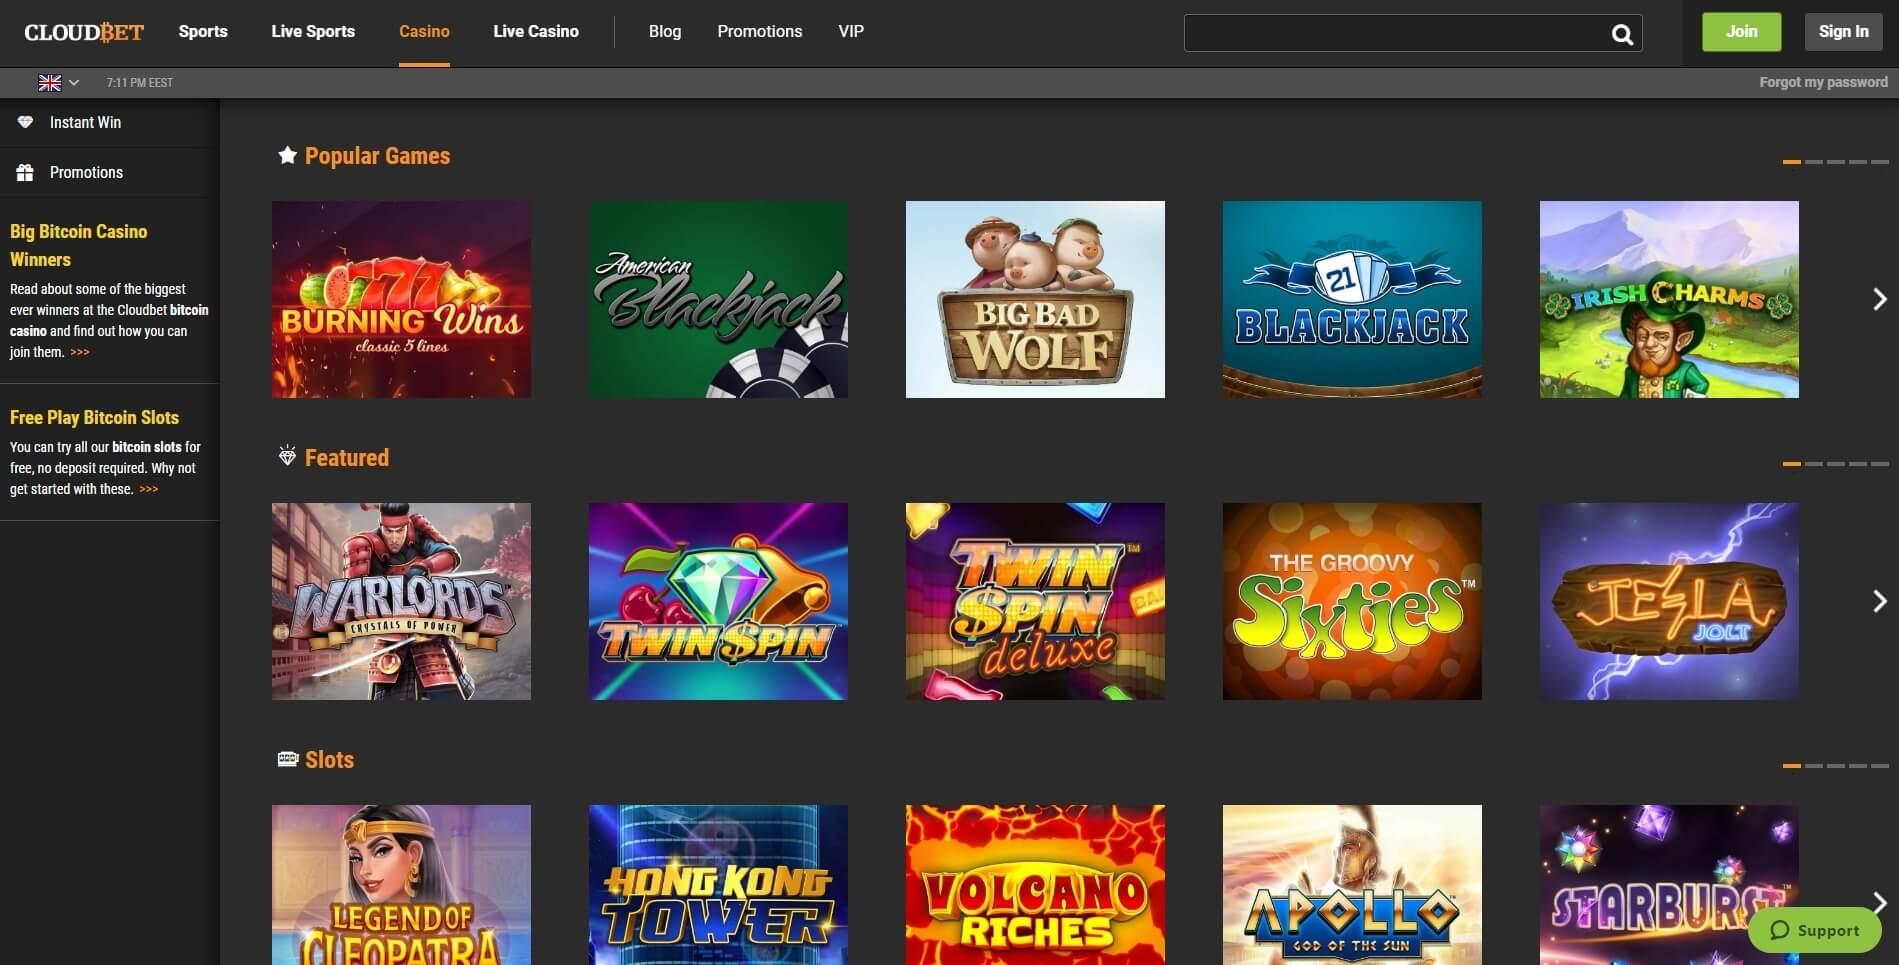 cloudbet casino slots